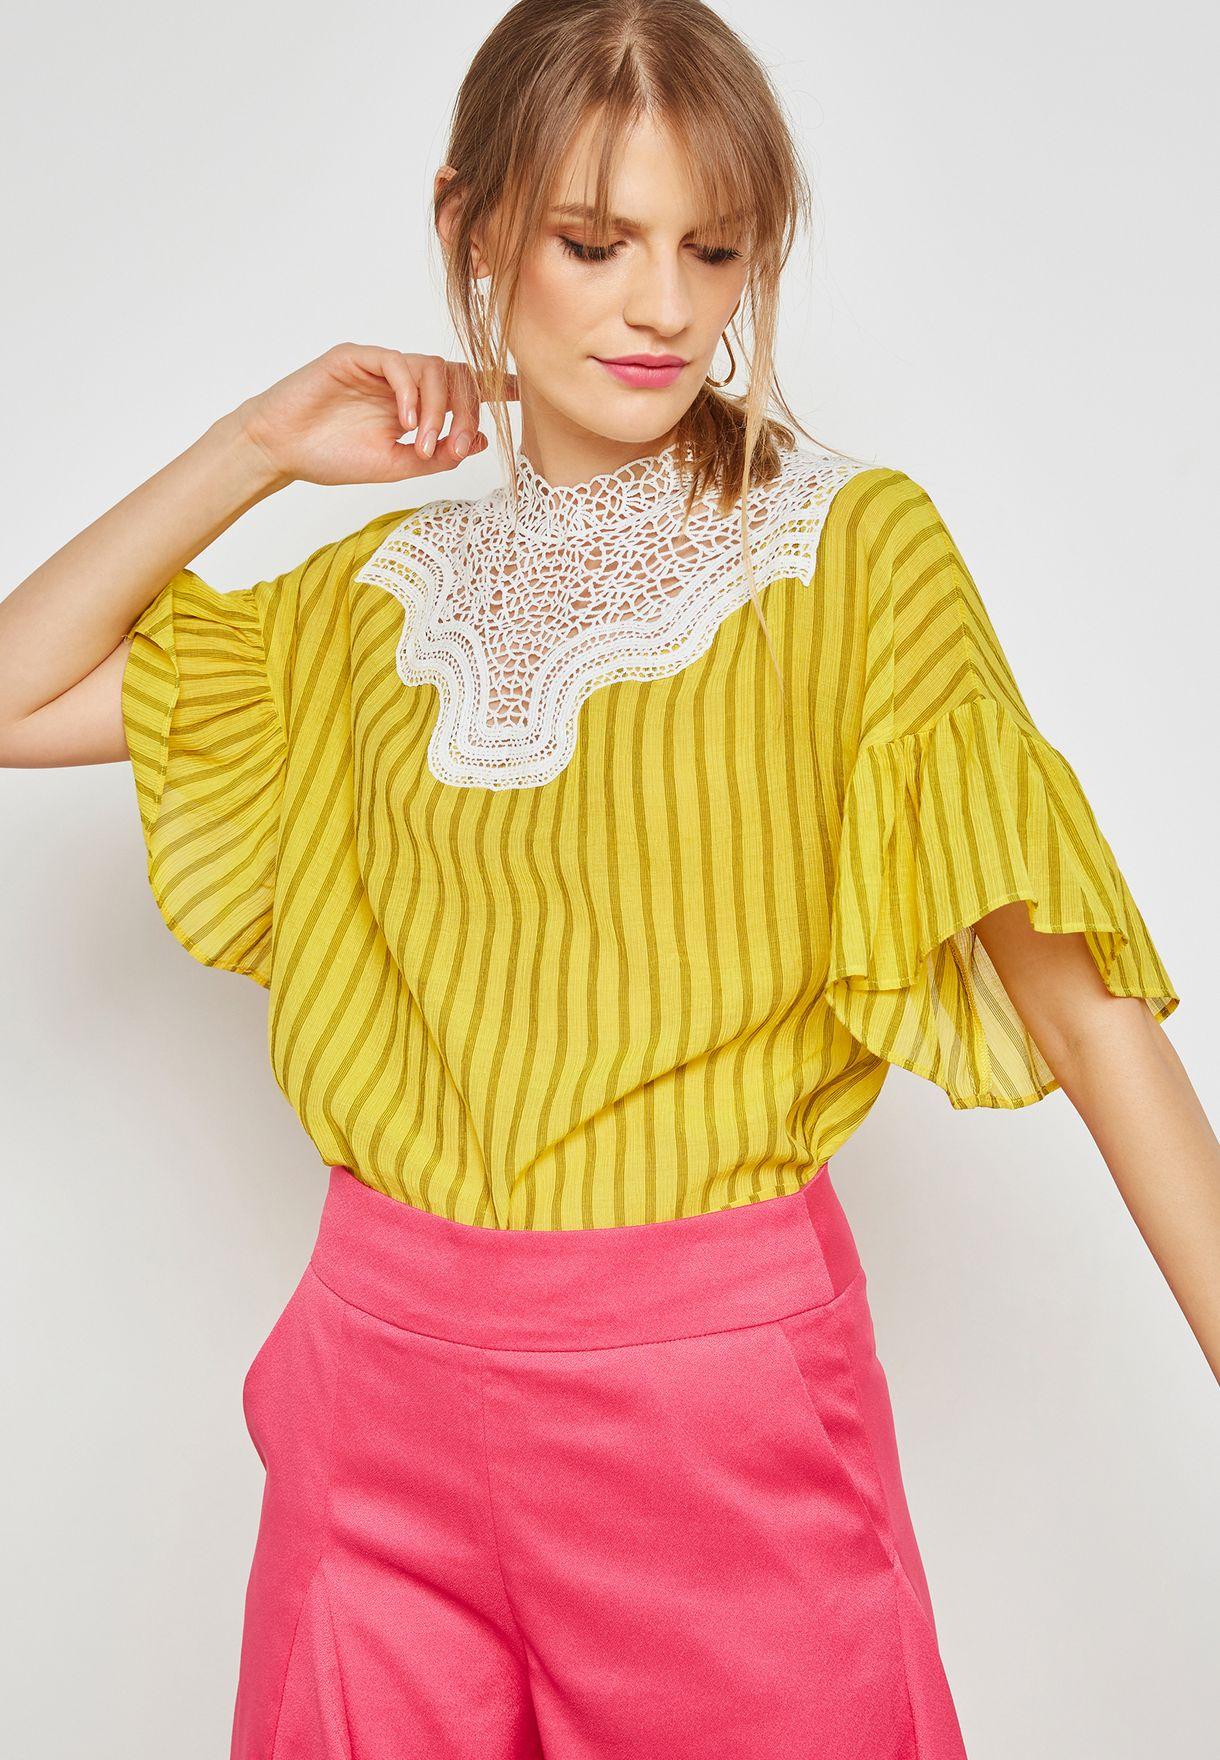 da373da6a4f Shop bYSI multicolor Crochet Bib Stripe Blouse ZBL370121 for Women in Qatar  - BY649AT12XVV